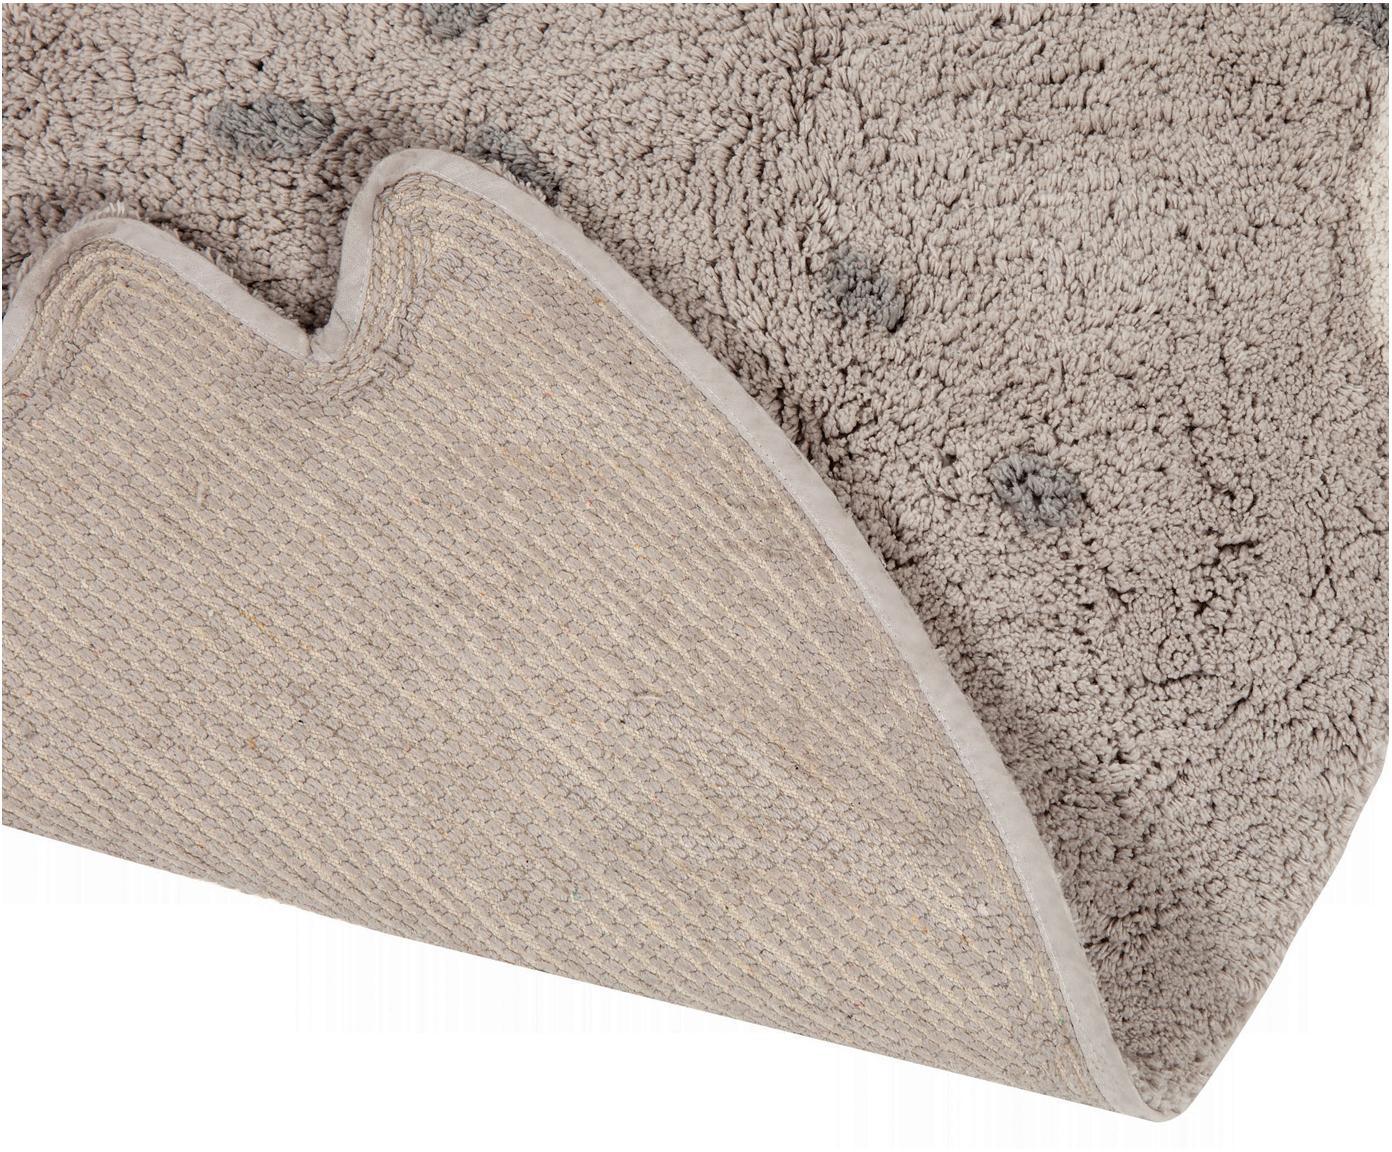 Teppich Sweet Pepa, Baumwolle, Braun, Beige, 95 x 120 cm